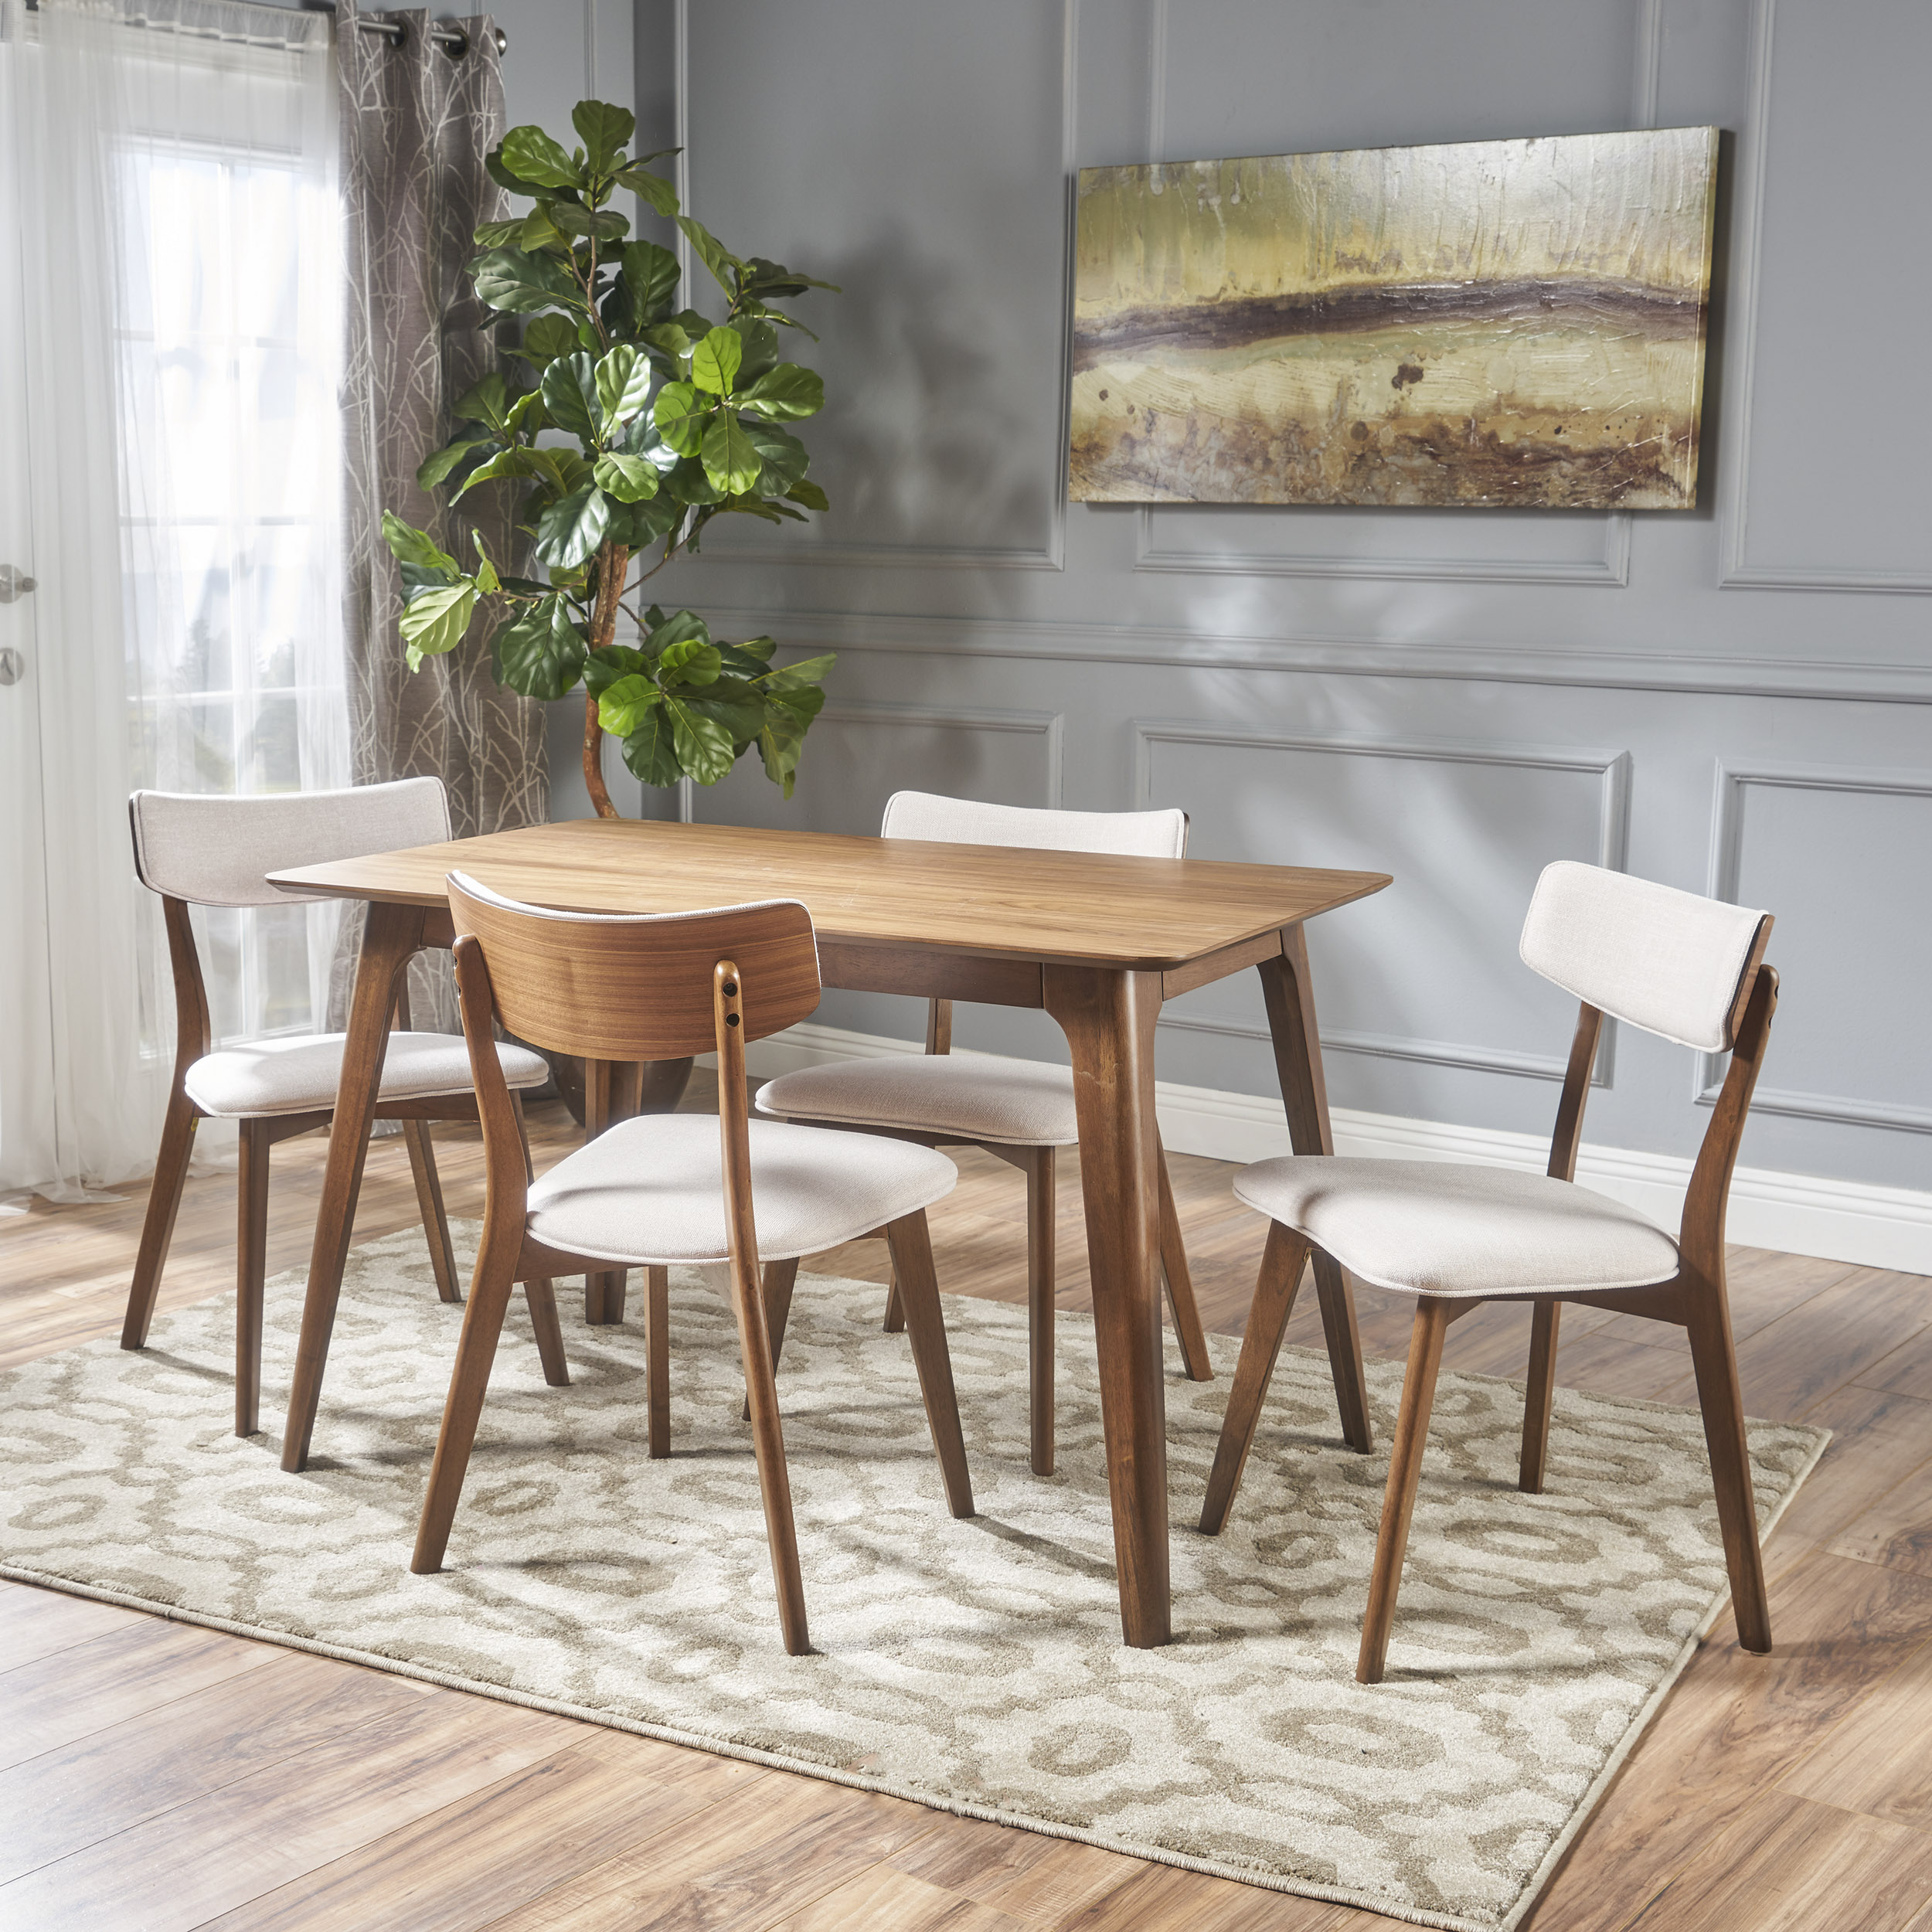 Noble House Alexa Mid Century Natural Walnut Wood Light Beige 5 Piece Dining Set